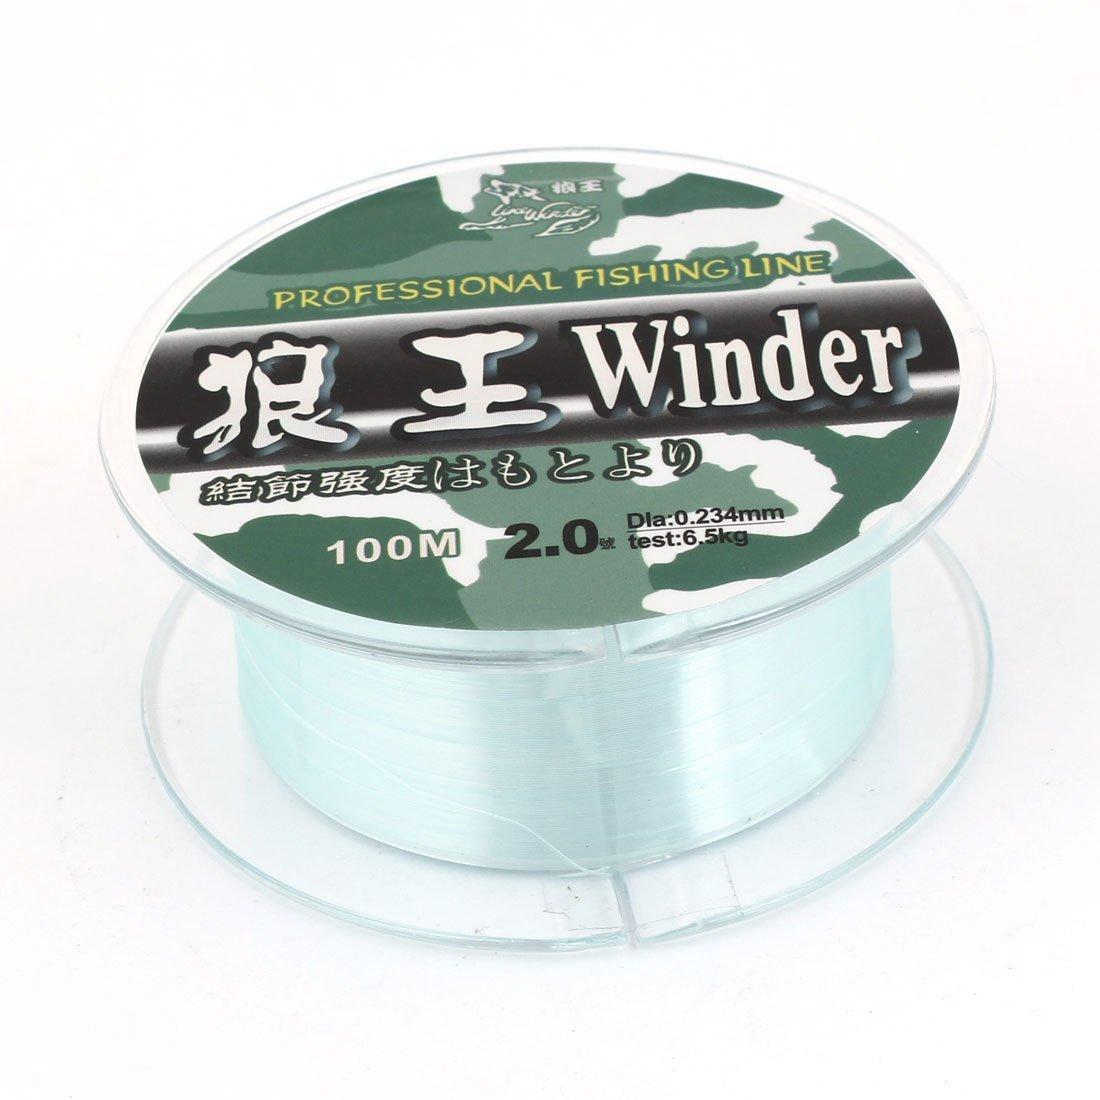 Como 2.0 # Vert Nylon Fil 0.234mm Dia 6,5 ??kg Ligne de pêche Spool 100M